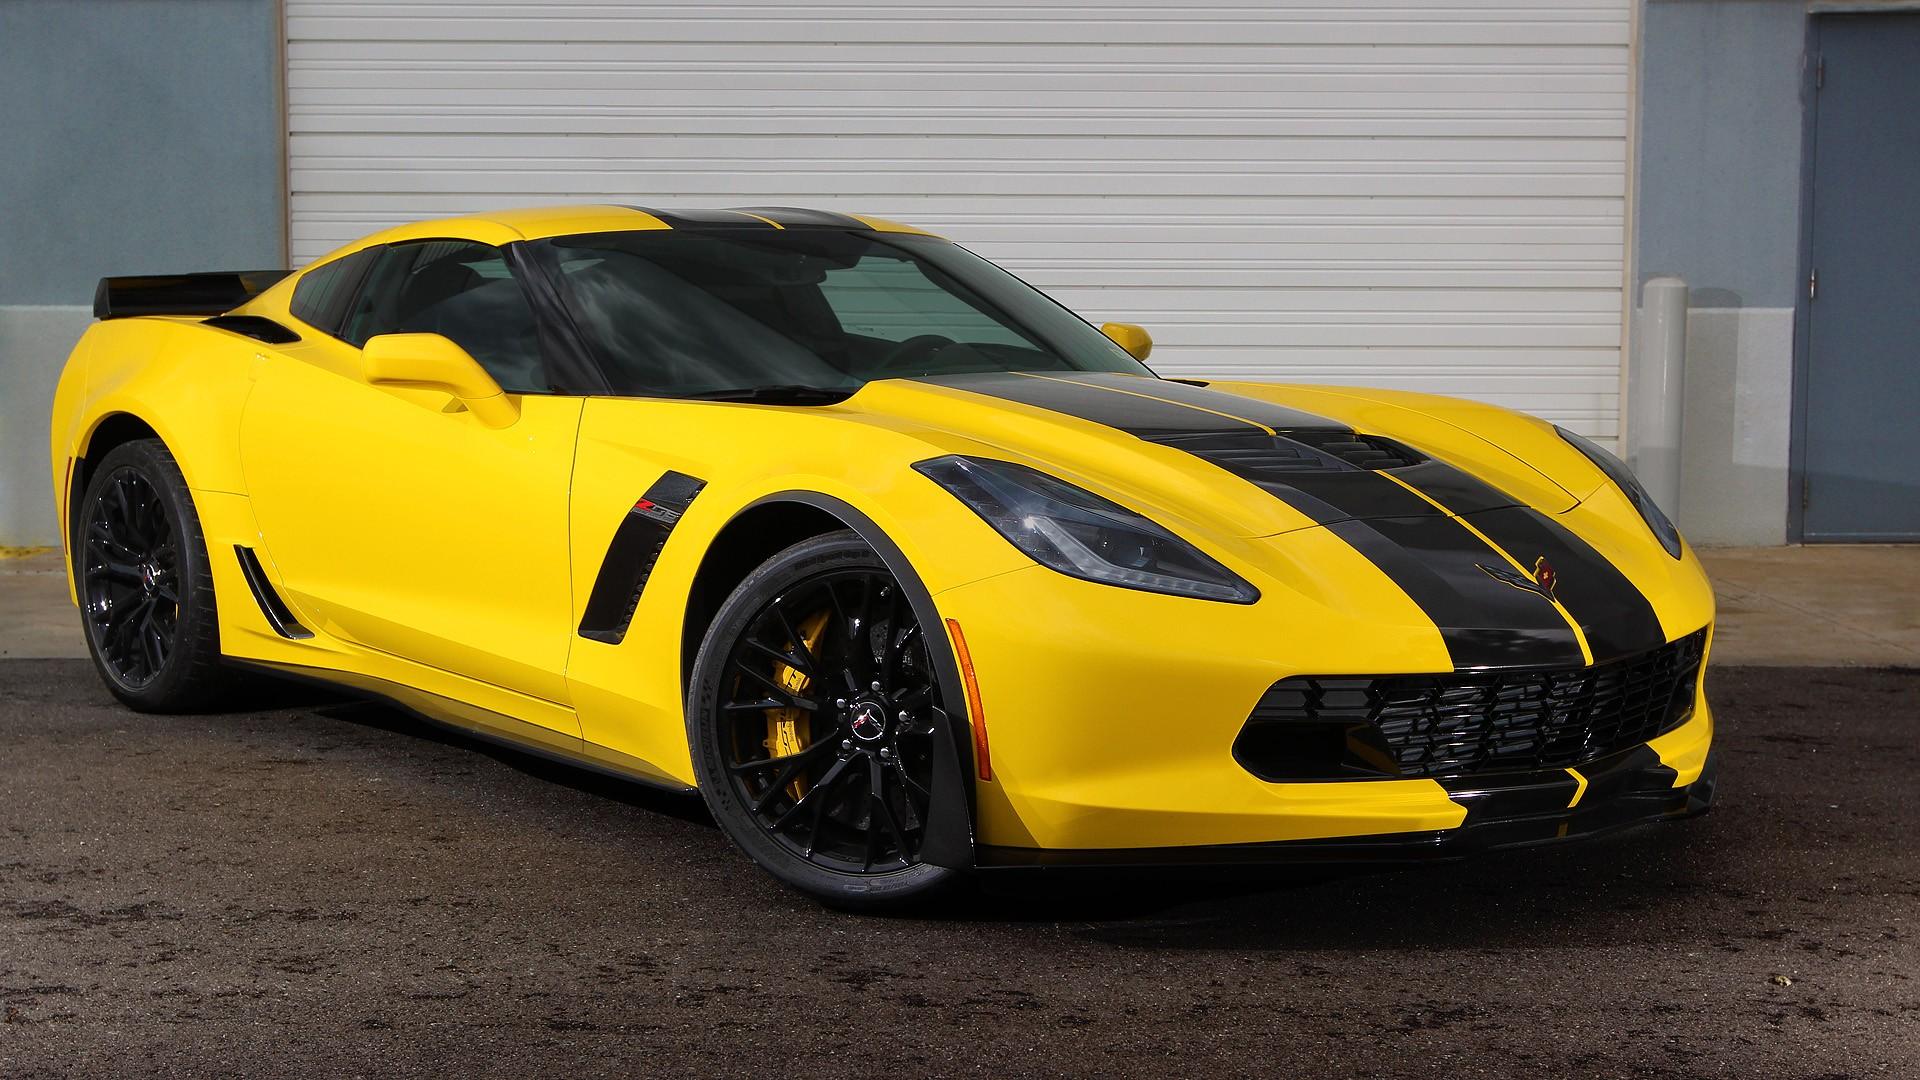 Тюнинг 2015 Chevrolet Corvette Z06 от Procharger